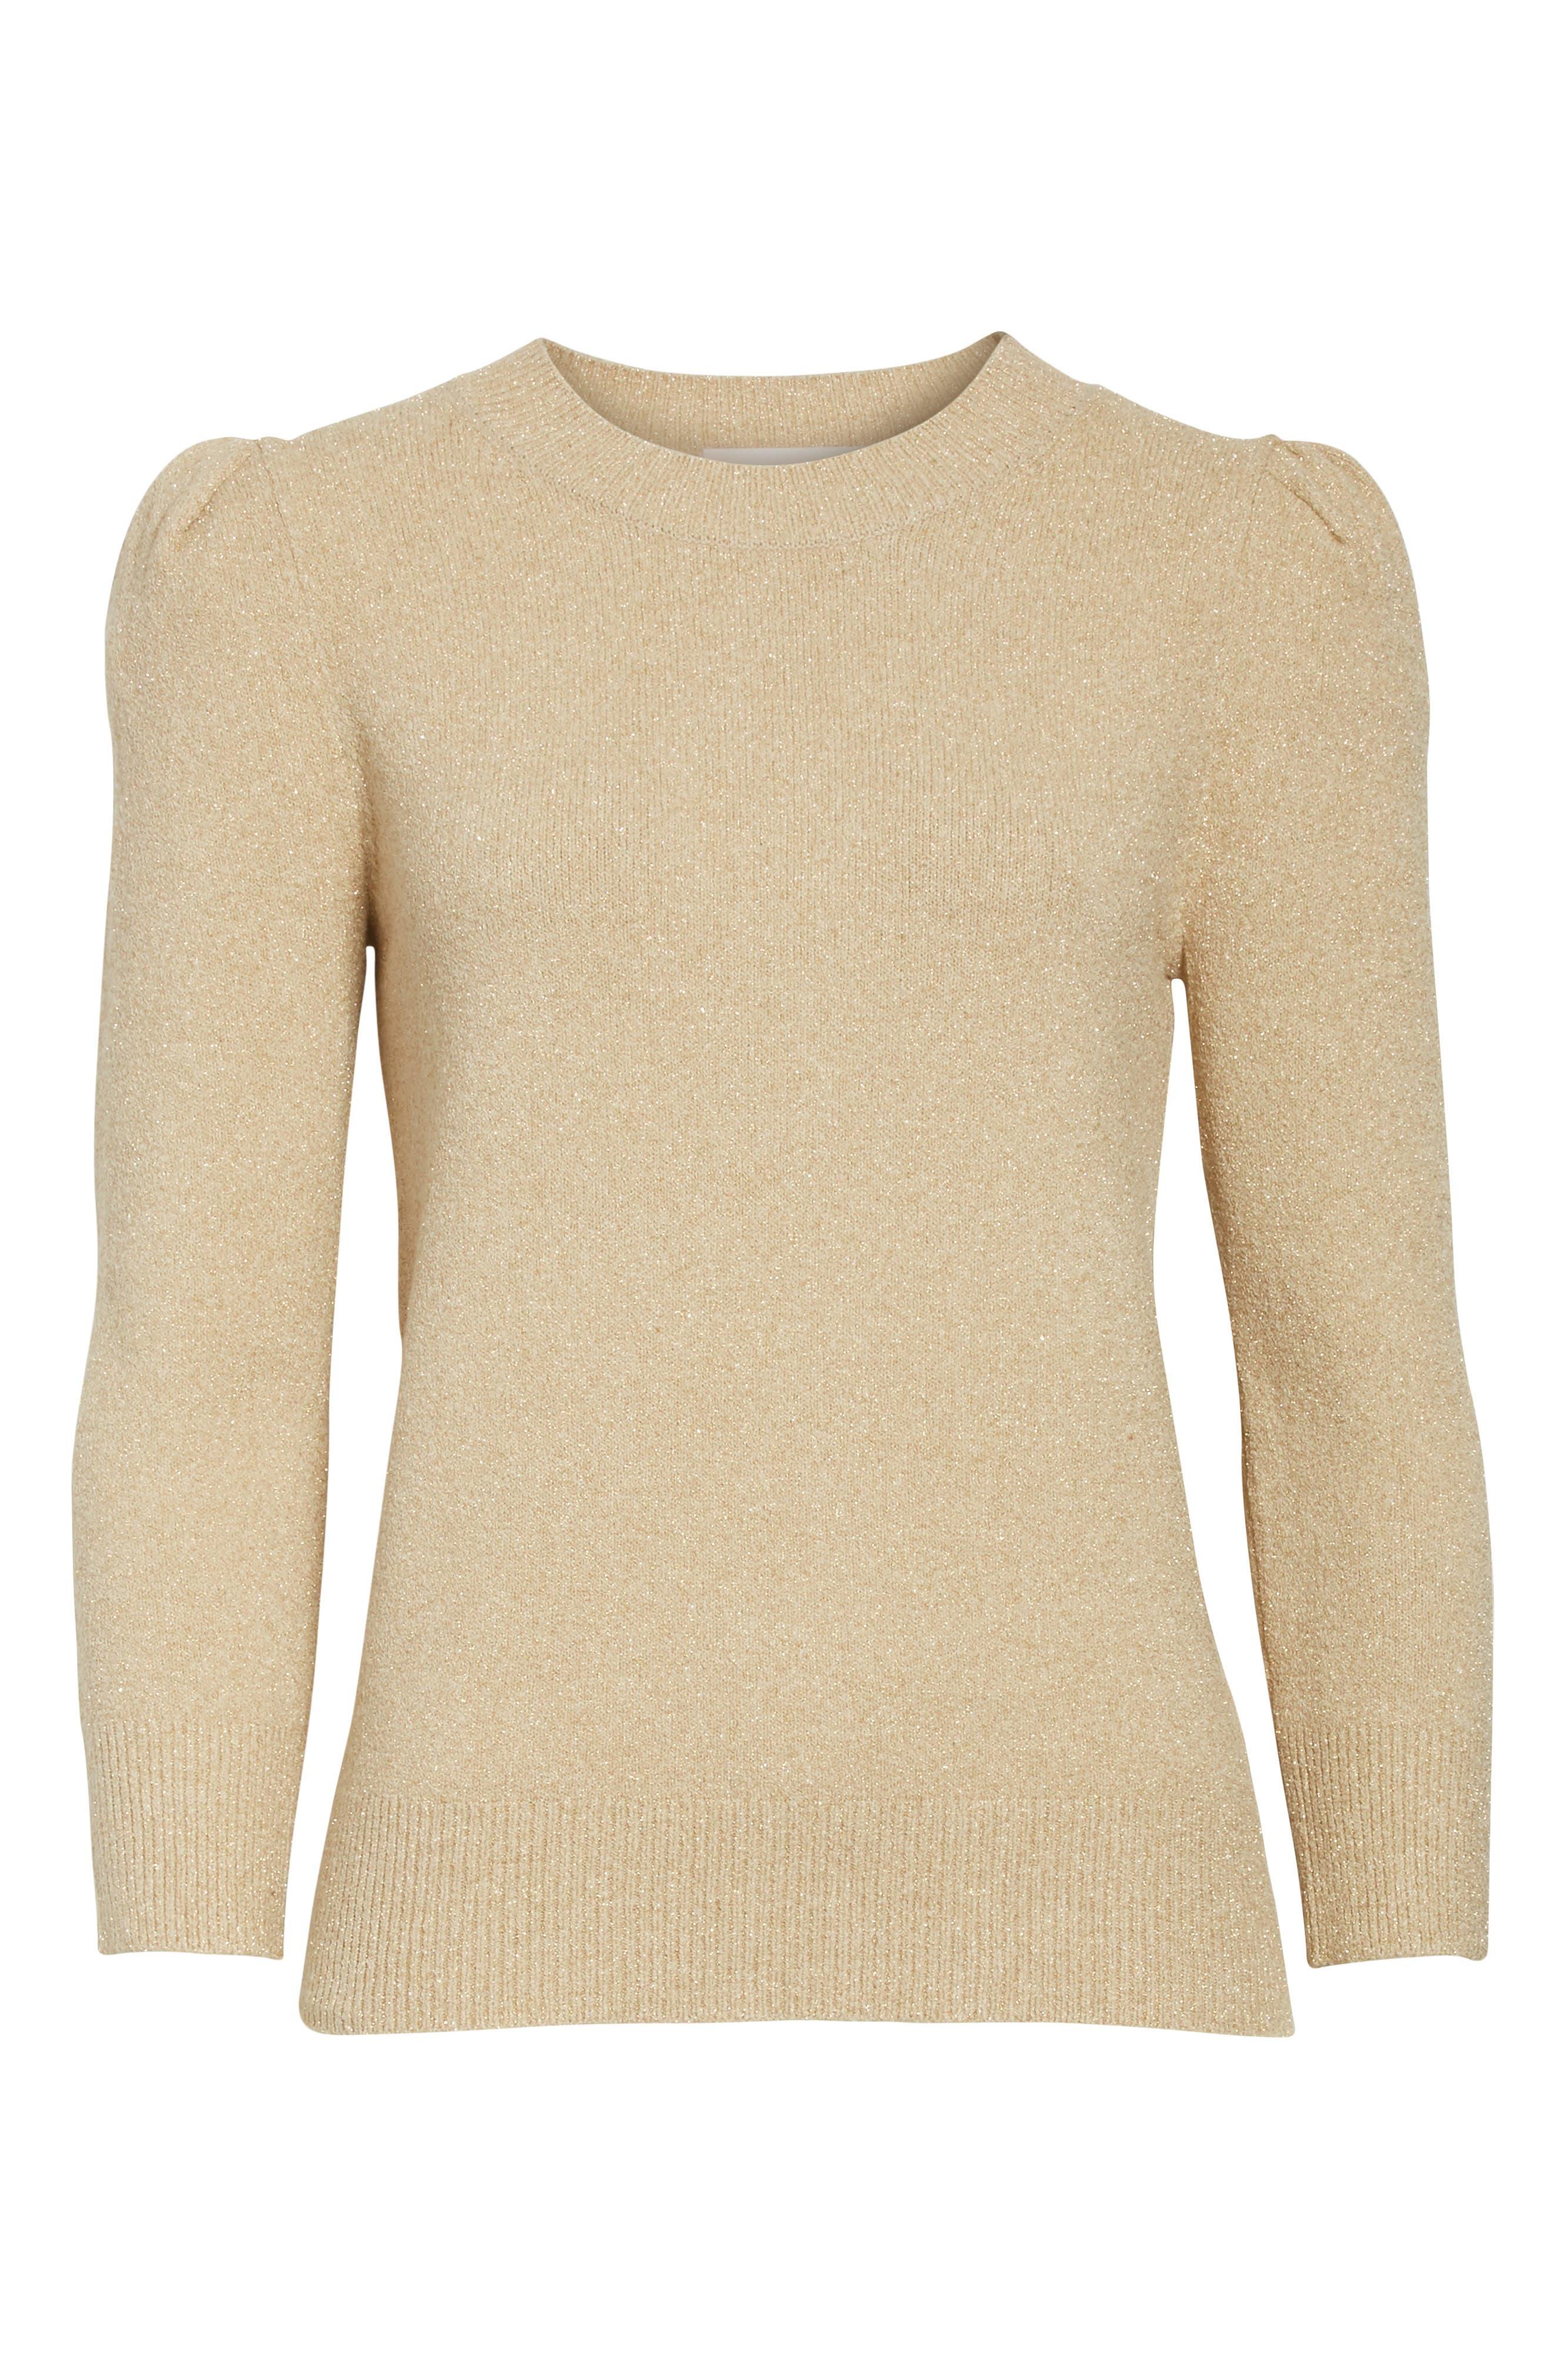 Metallic Knit Puff Sleeve Sweater,                             Alternate thumbnail 6, color,                             200